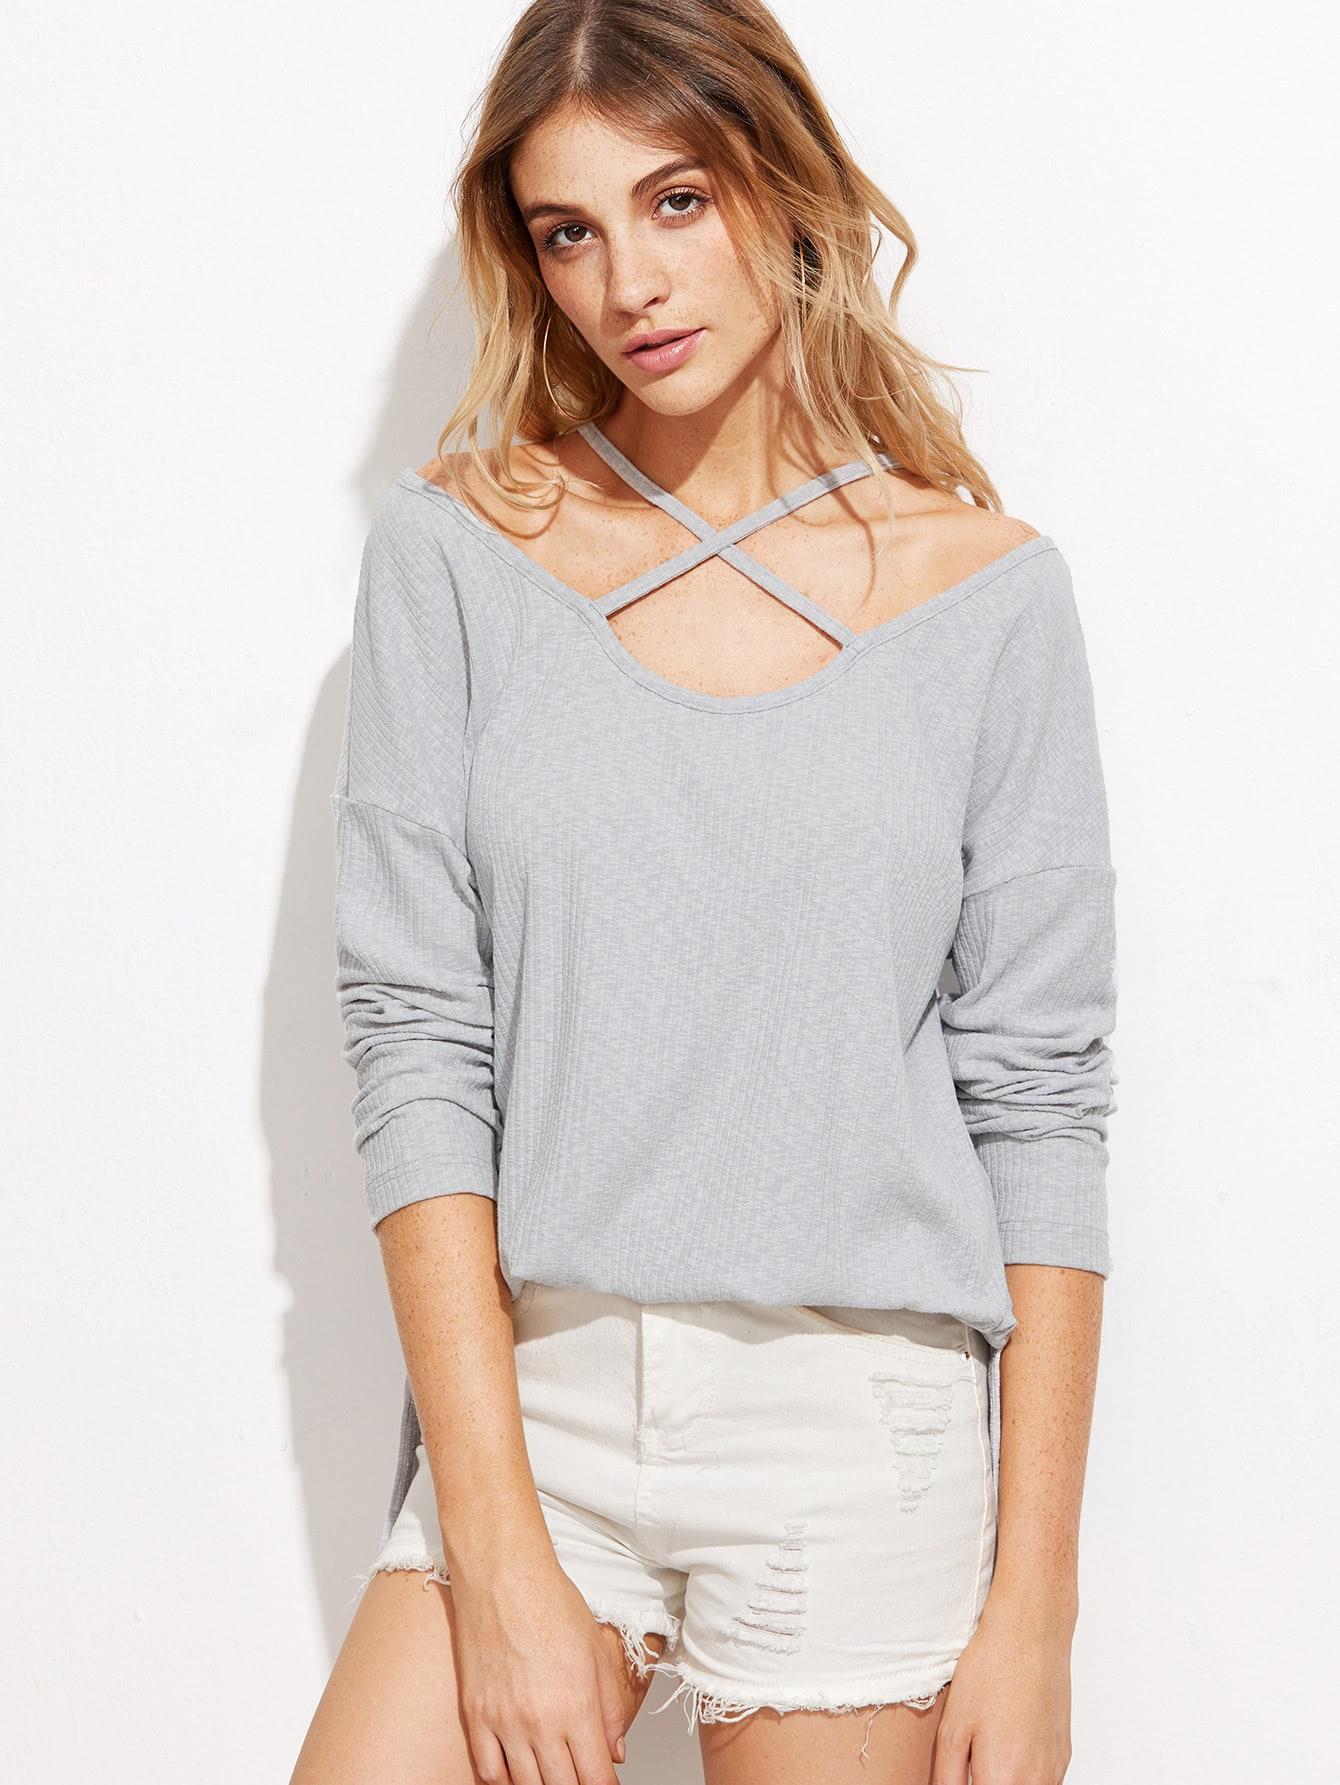 Heather Grey Ribbed Crisscross T-shirt tee161010701